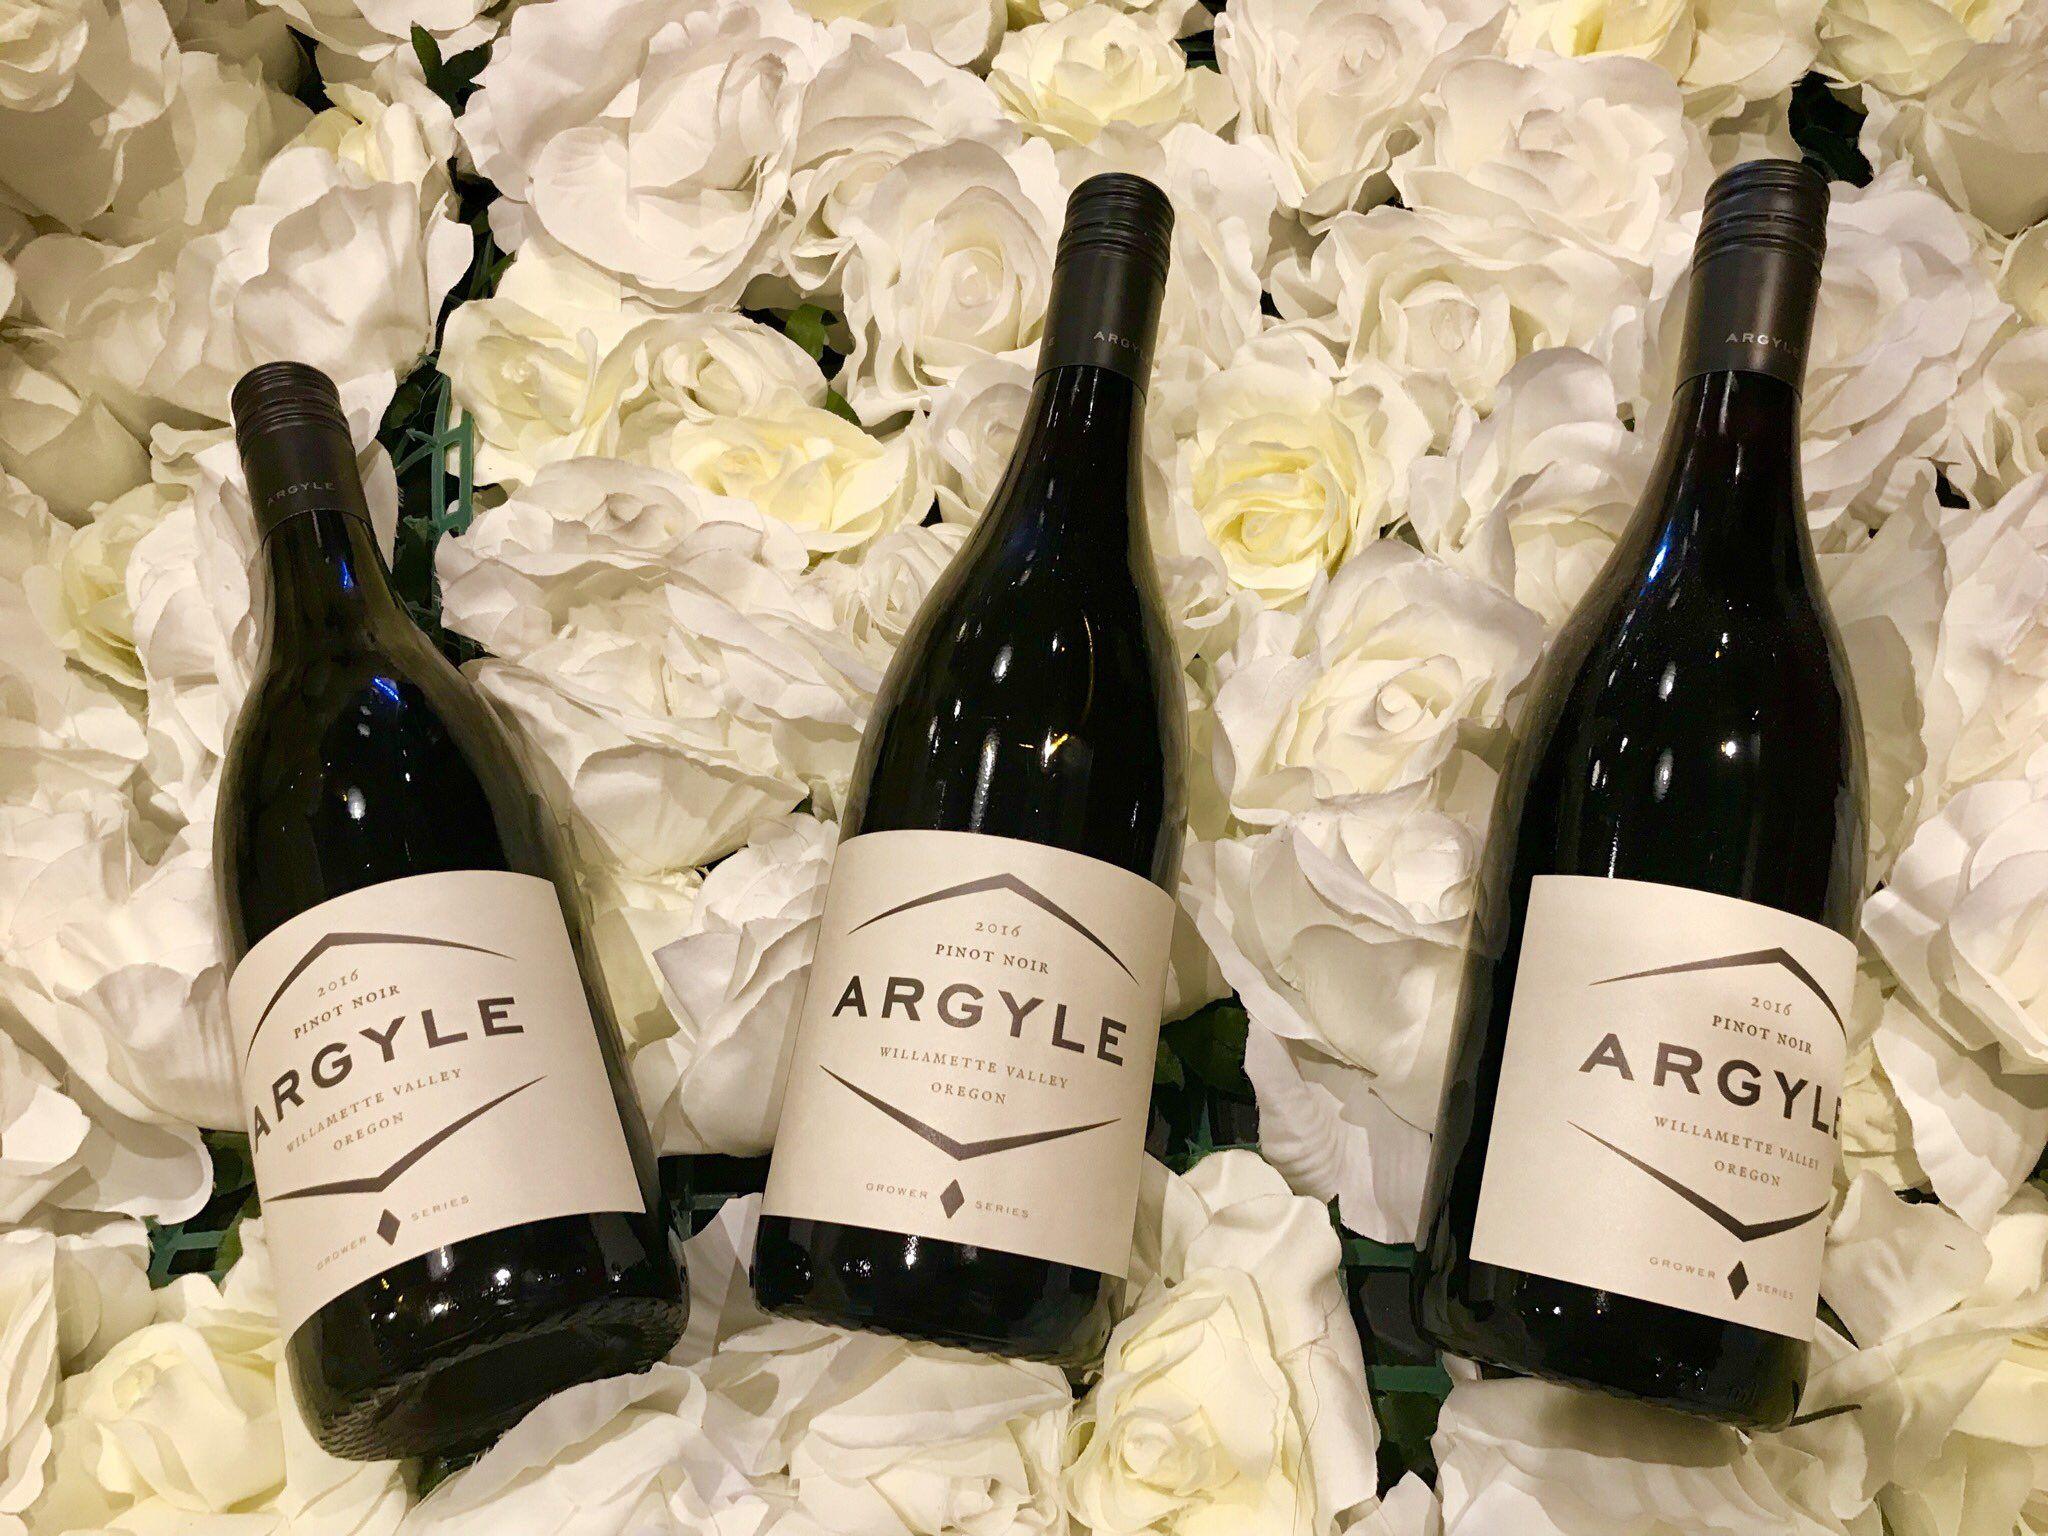 Alan Semsar on   Wine   Wine festival, Las vegas food, Argyle winery